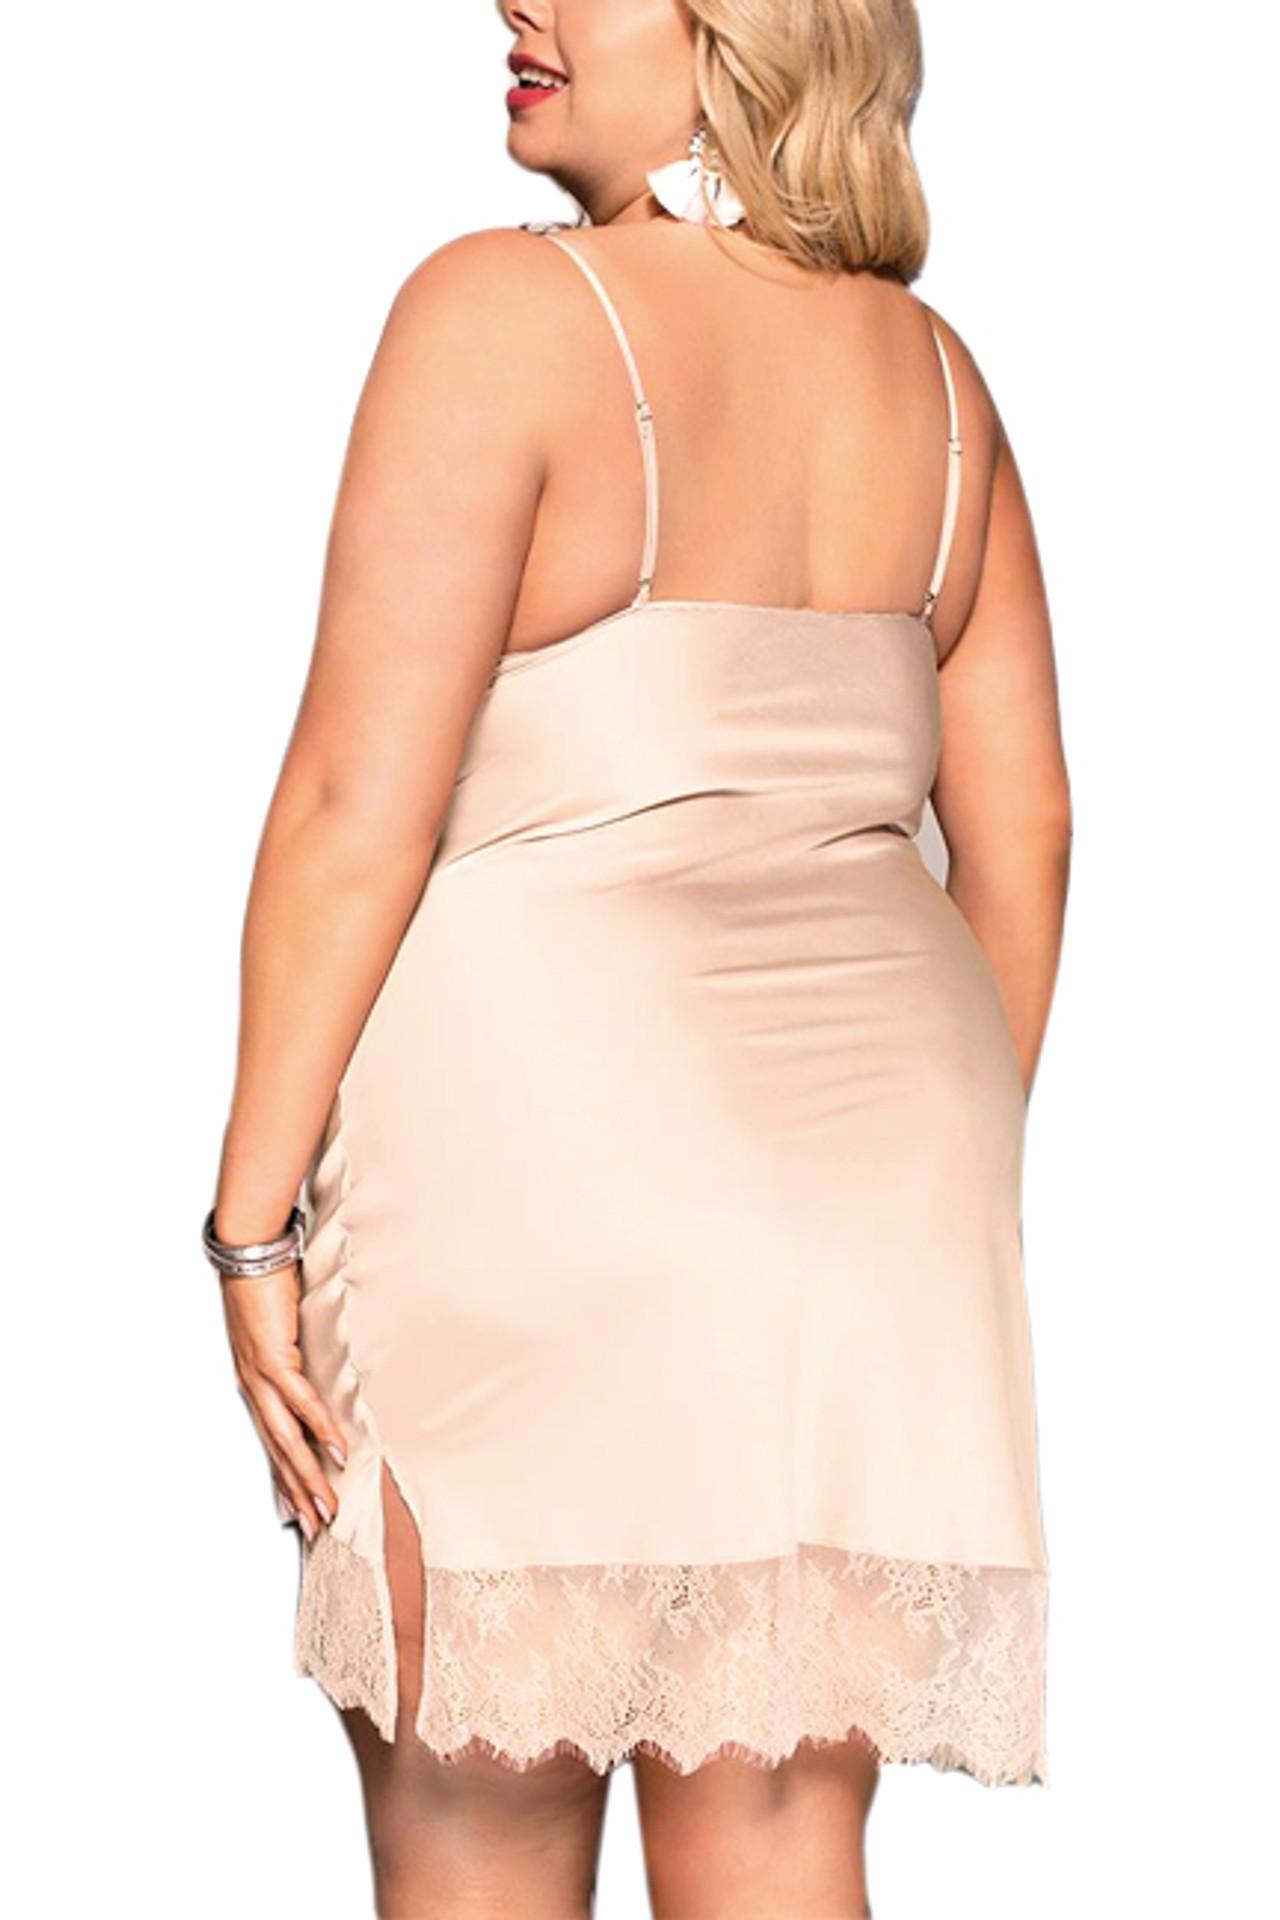 Mabel Nude Satin Sleep Chemise Plus Size